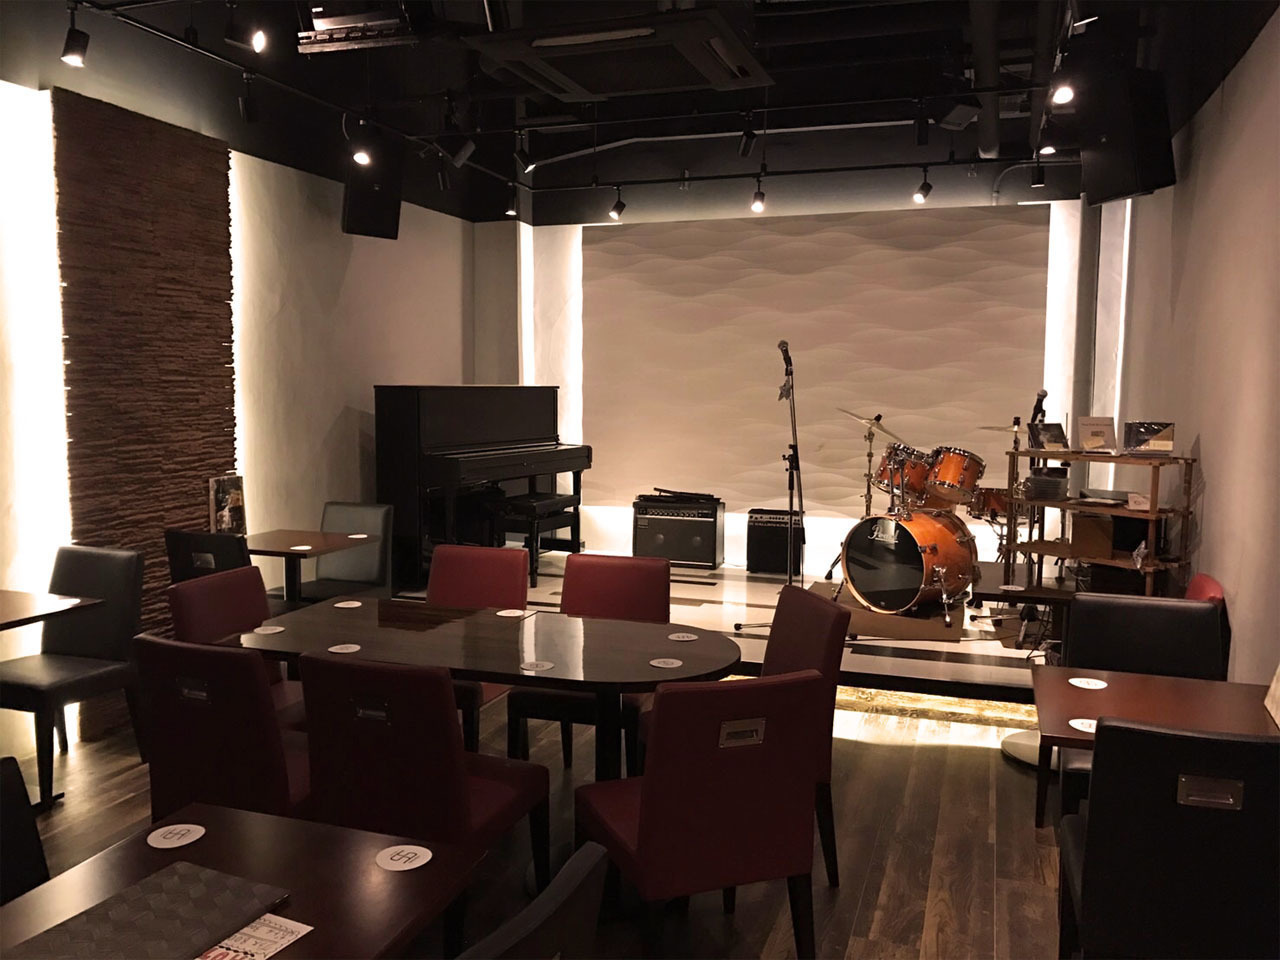 BAR Swing & Soul【赤坂・警固】多目的レンタルスペース/スタジオやイベント、ワークショップ(BAR Swing & Soul) の写真0